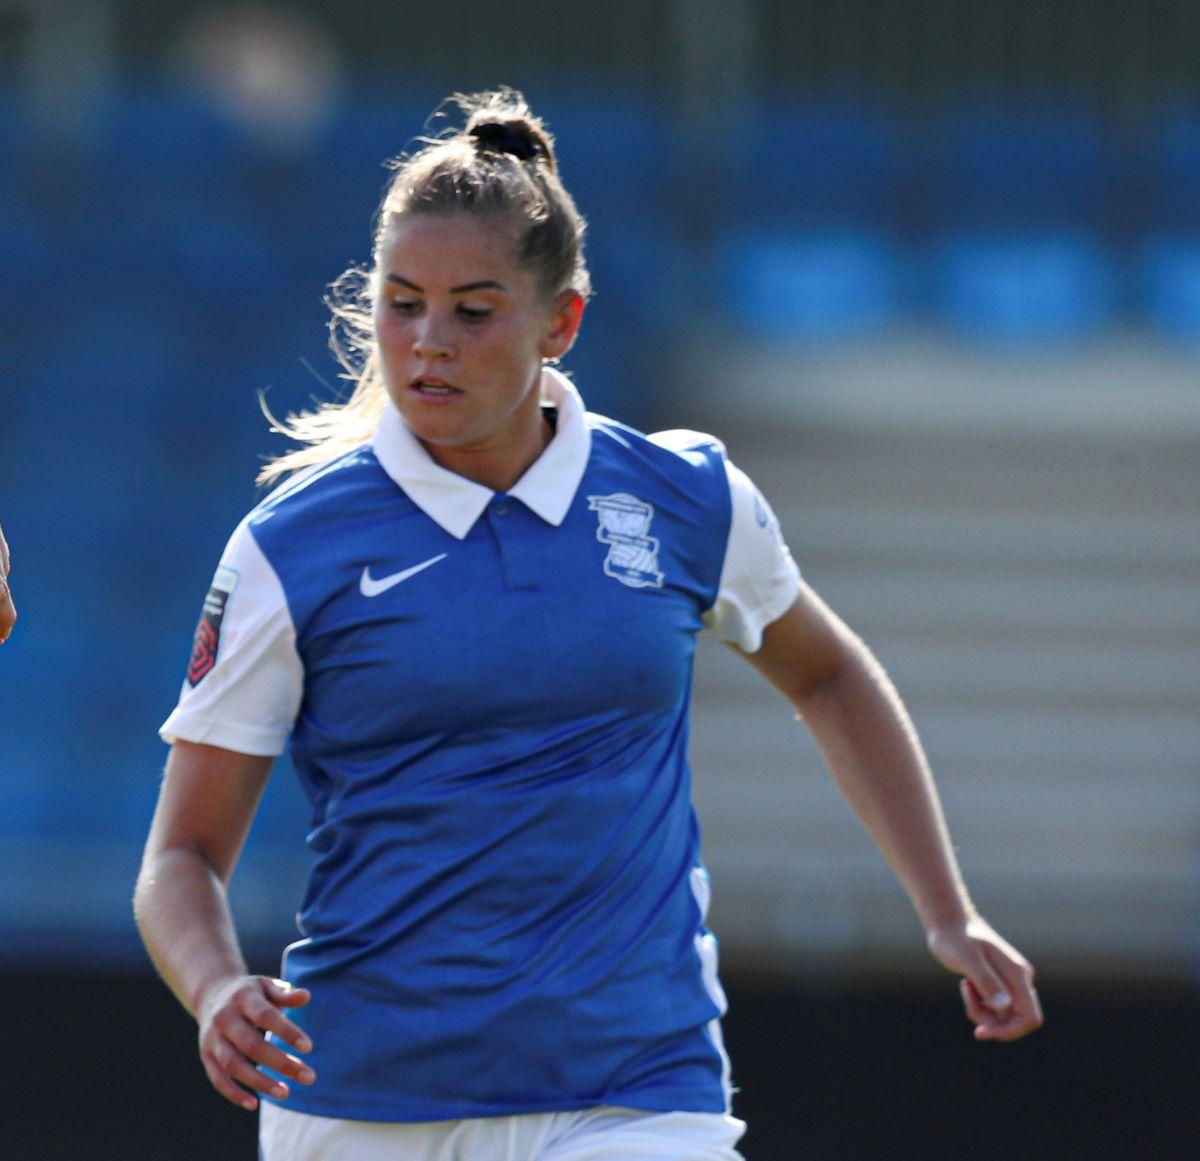 Scorer of Birmingham City's winning penalty, Georgia Brougham